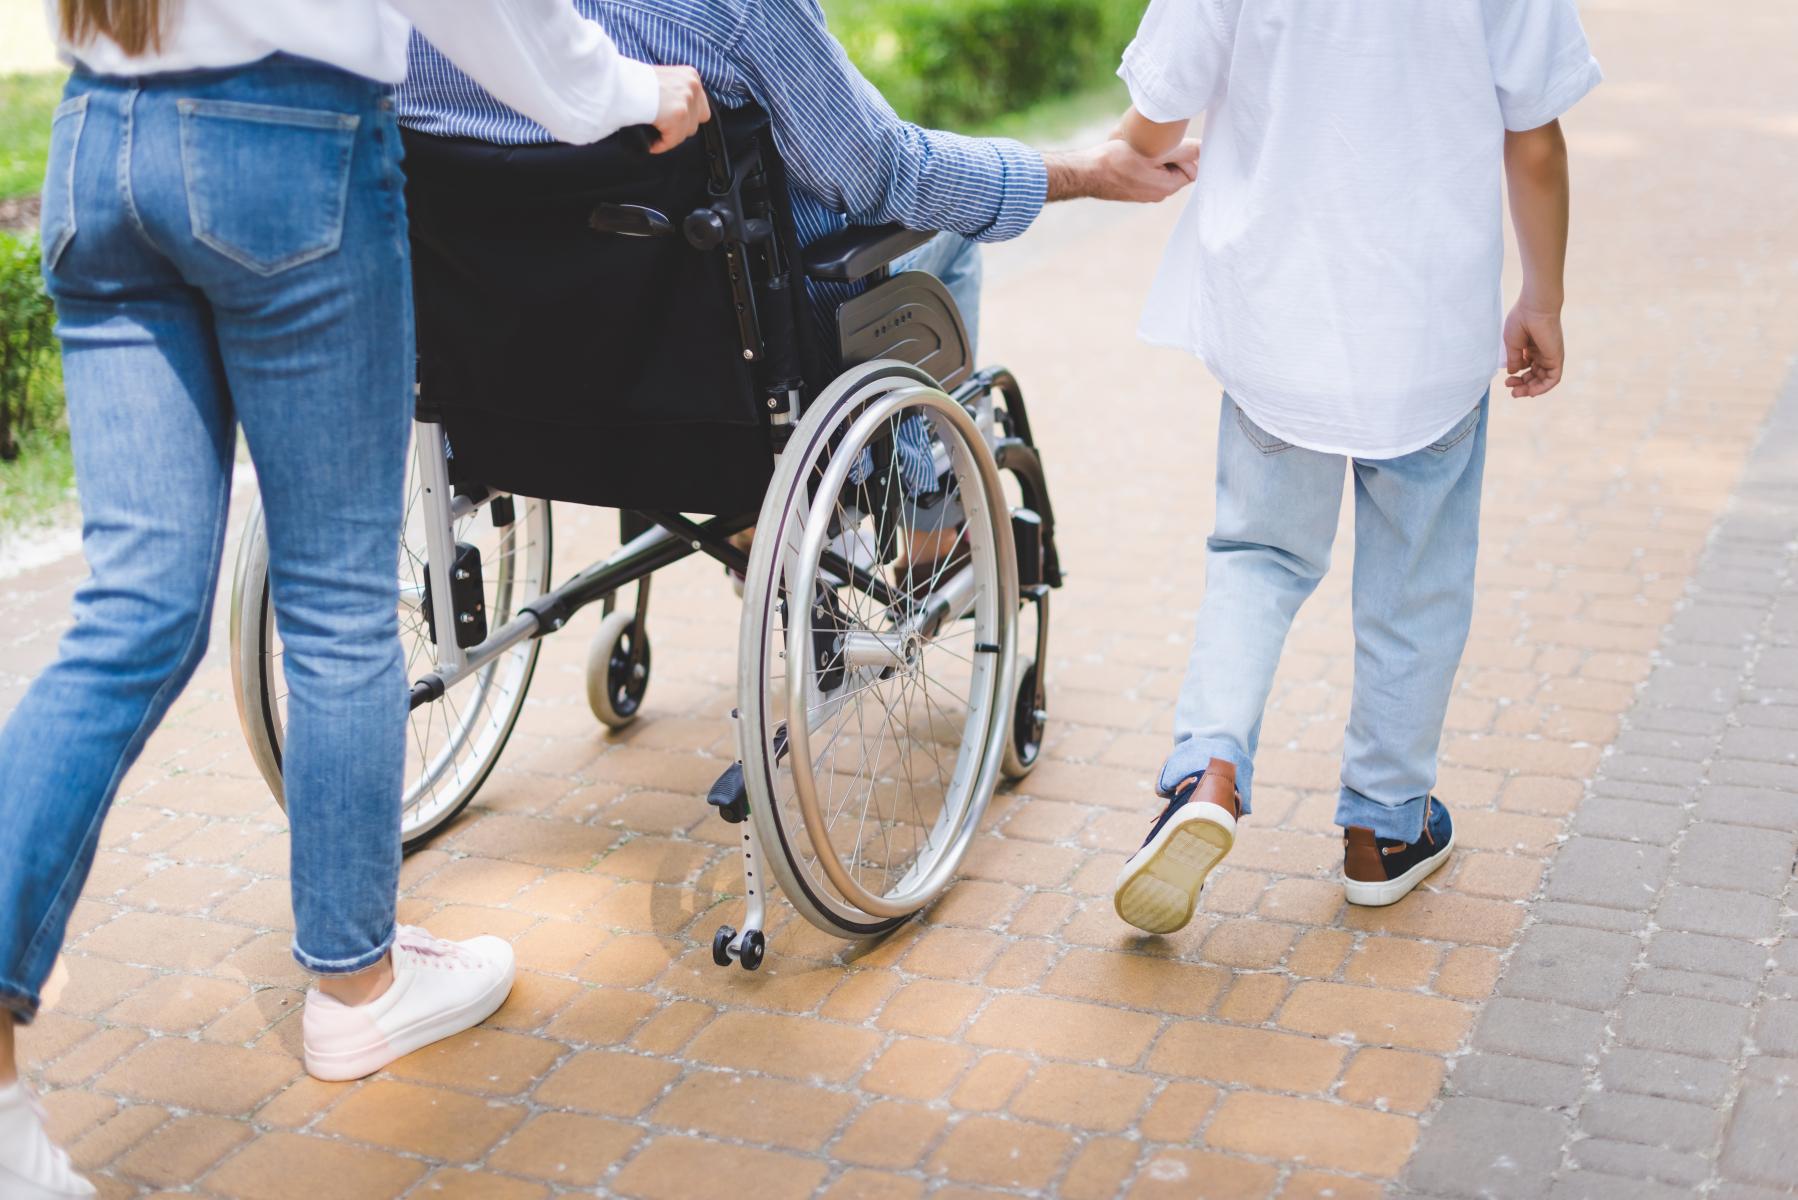 Pasient i rullestol